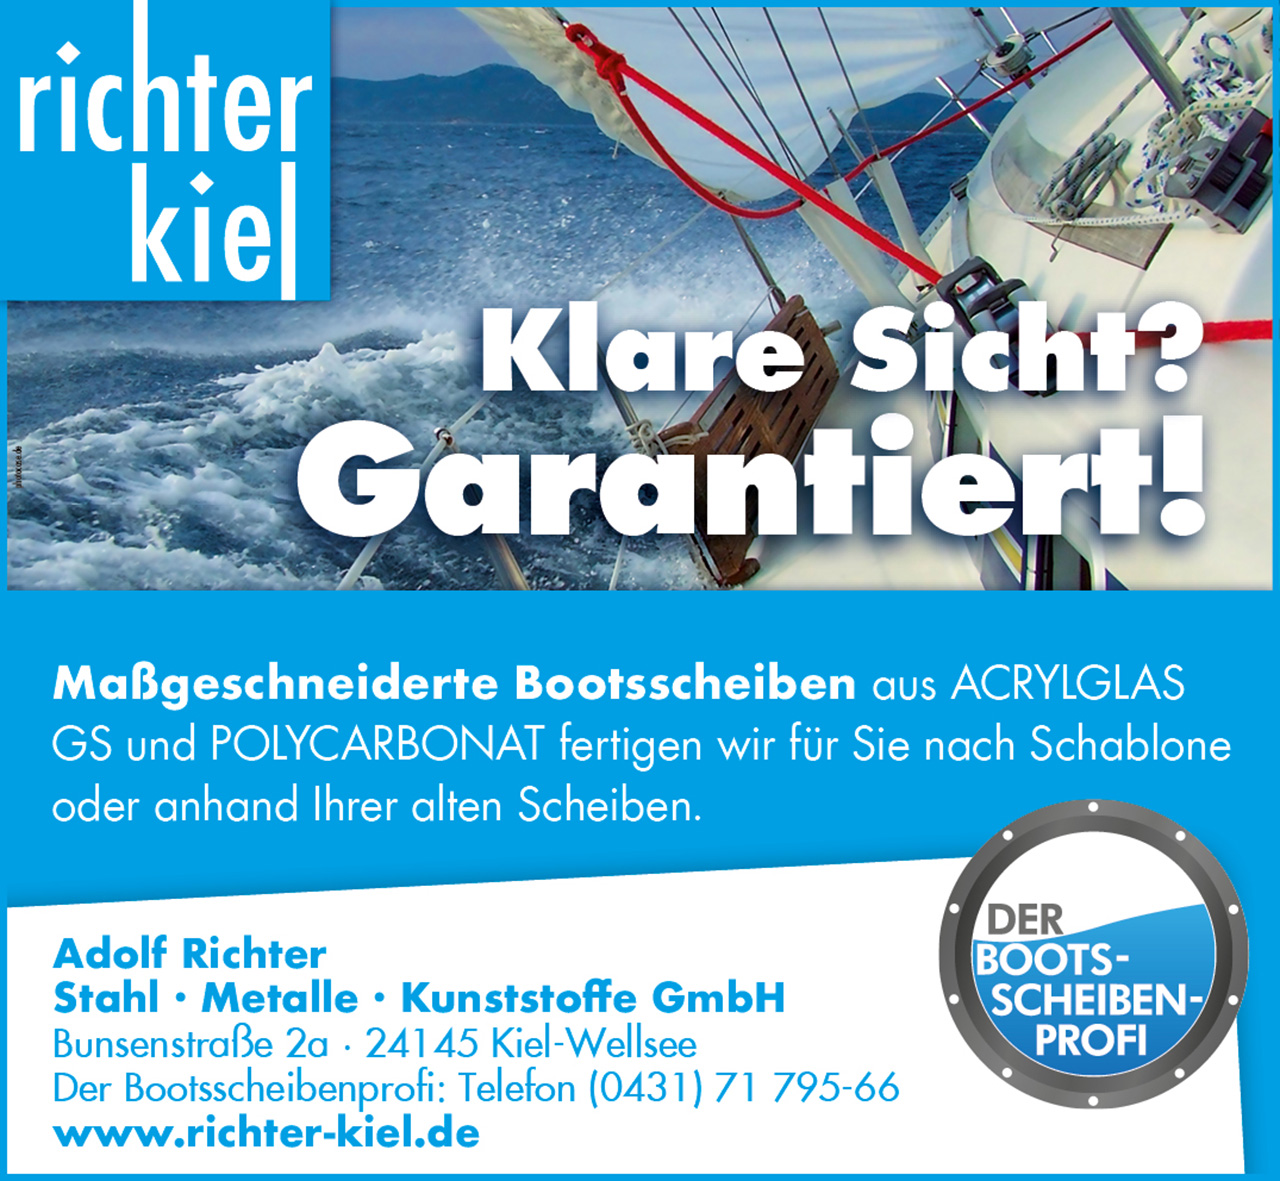 Adolf Richter Kiel